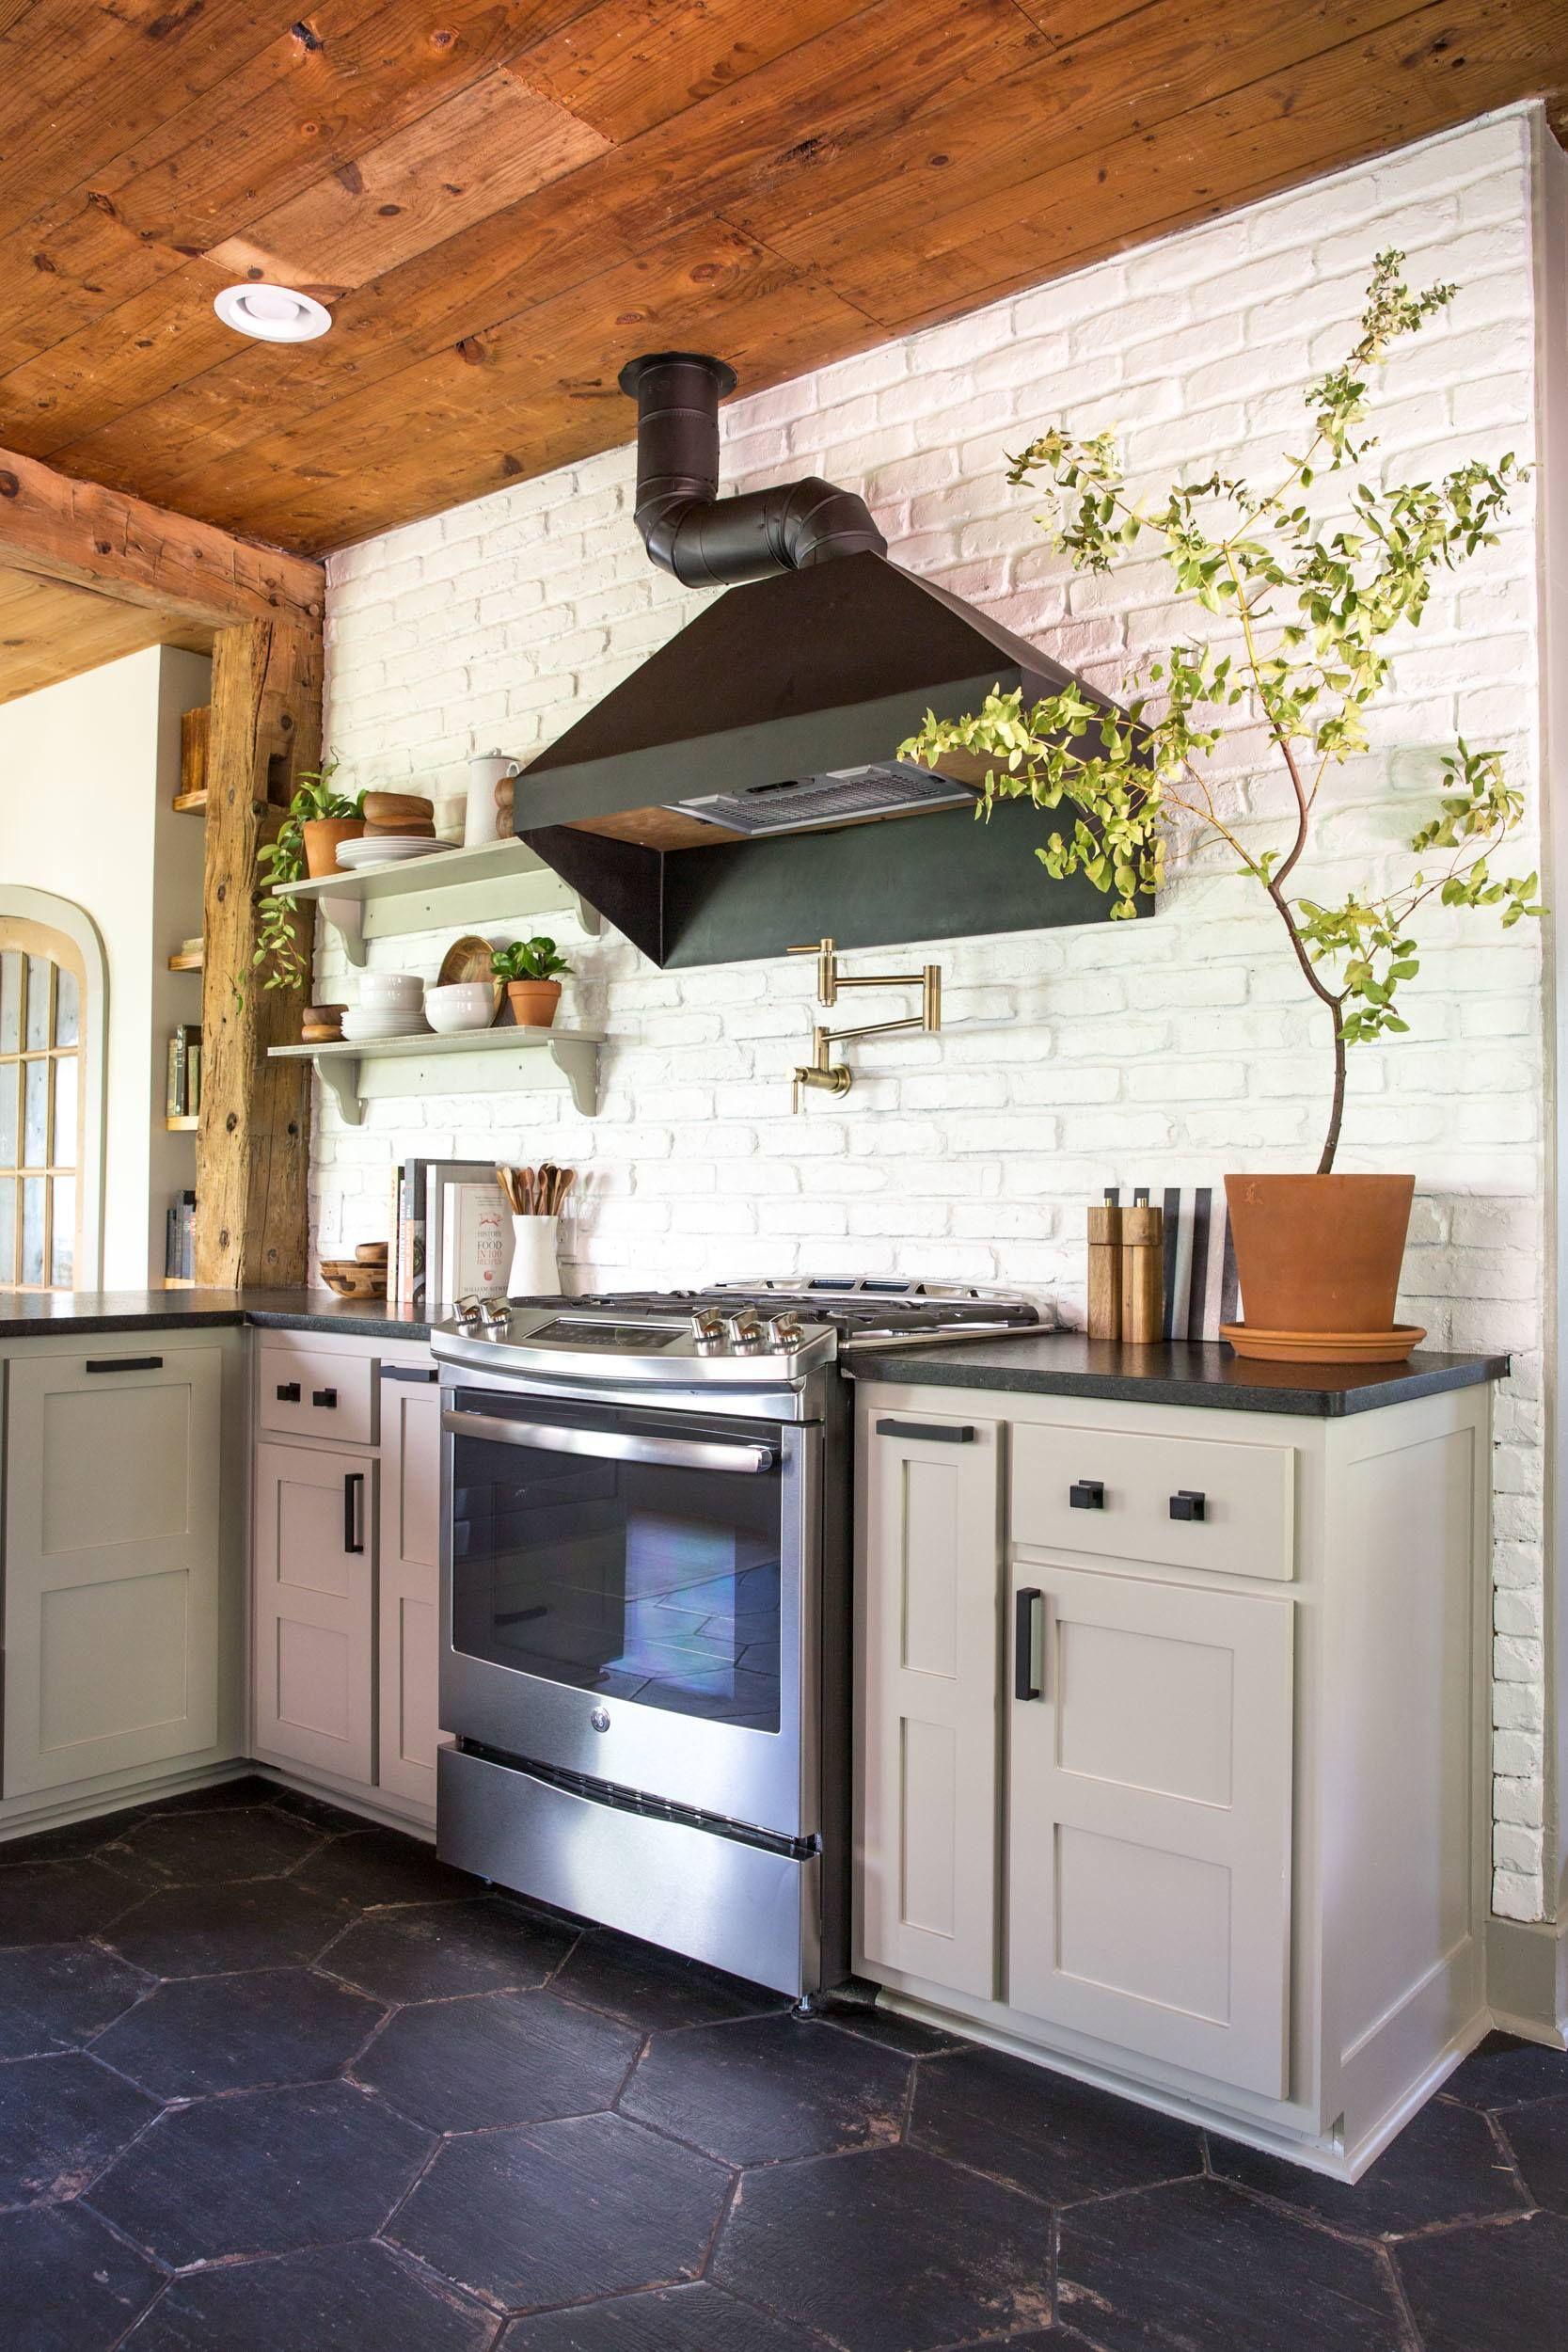 episode 15 the giraffe house kitchen flooring kitchen tiles design fixer upper kitchen on farmhouse kitchen flooring id=60744